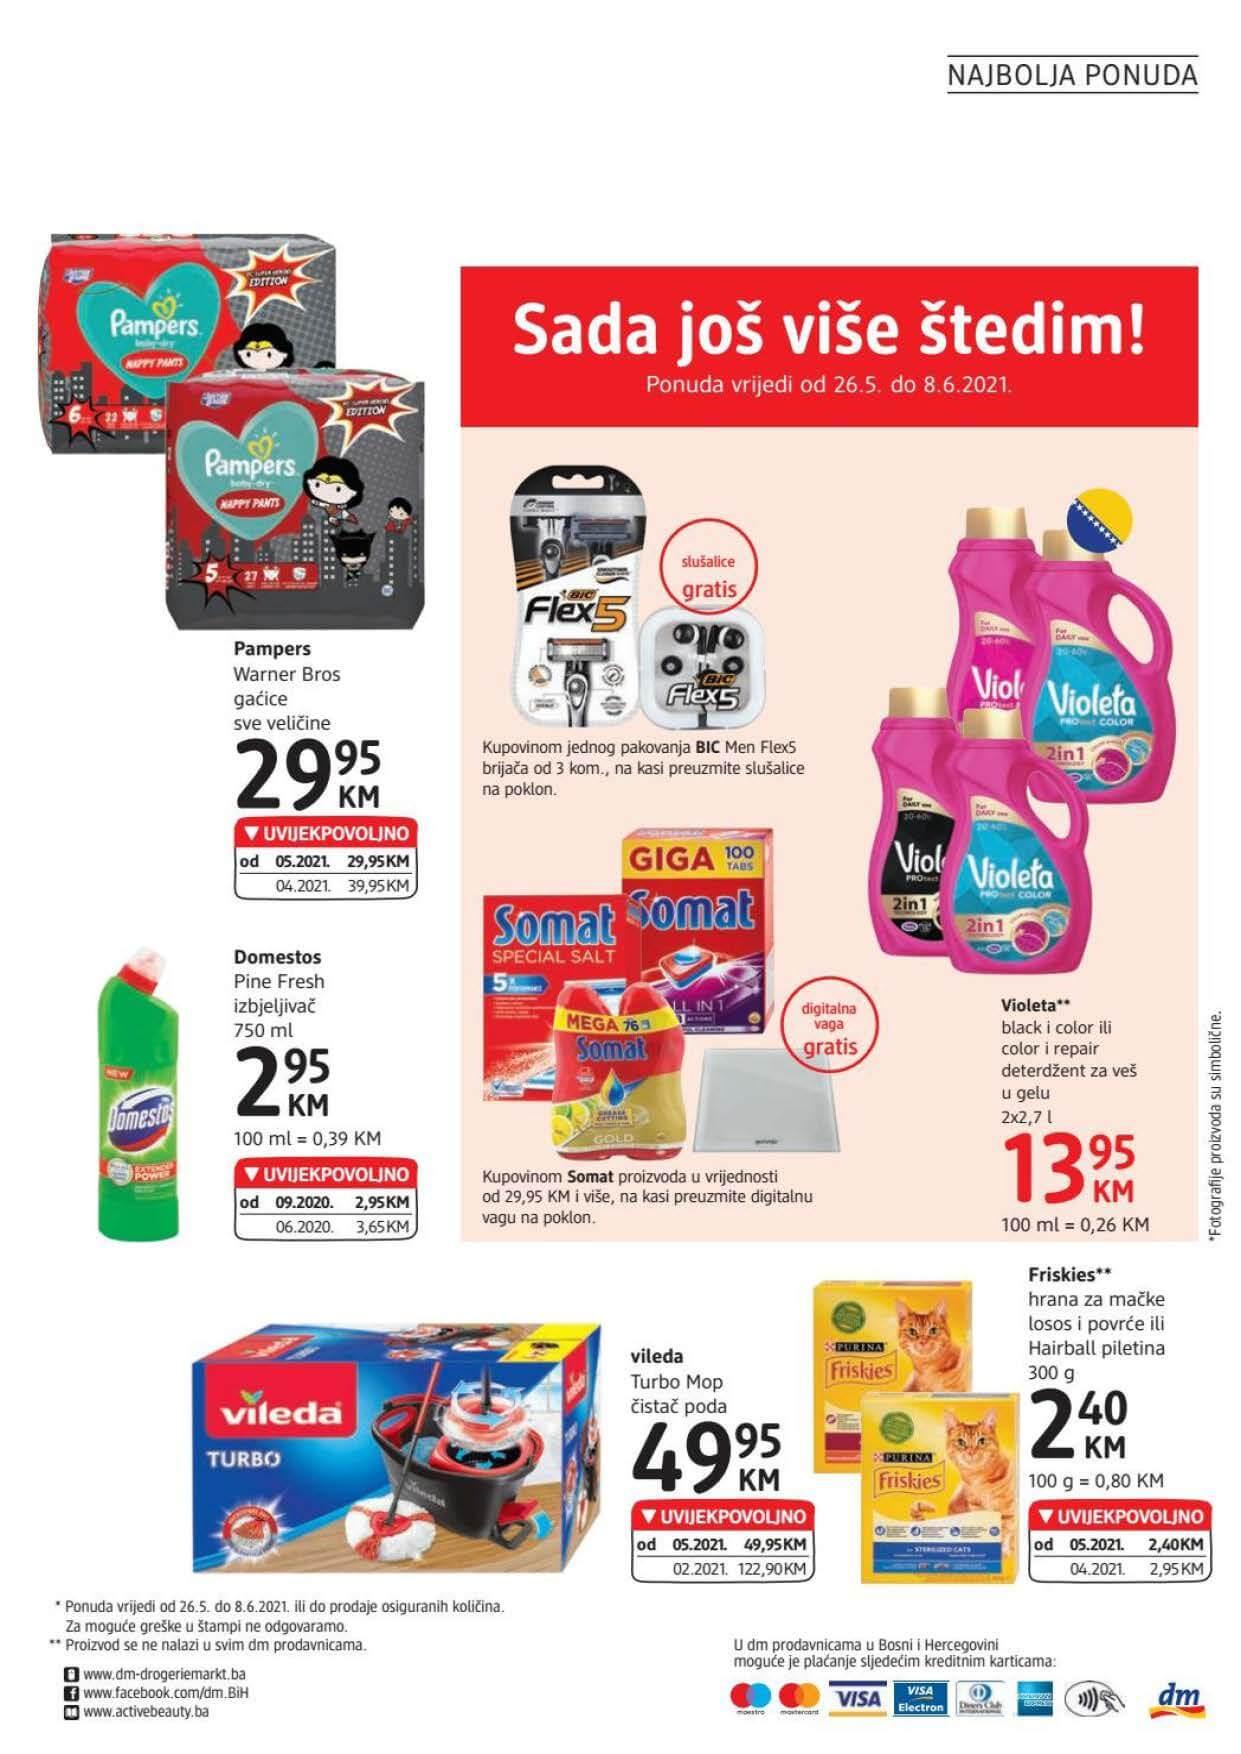 DM Katalog BiH Maj Jun 2021 26.05.2021. 08.06.2021. eKatalozi.com dm Page 24